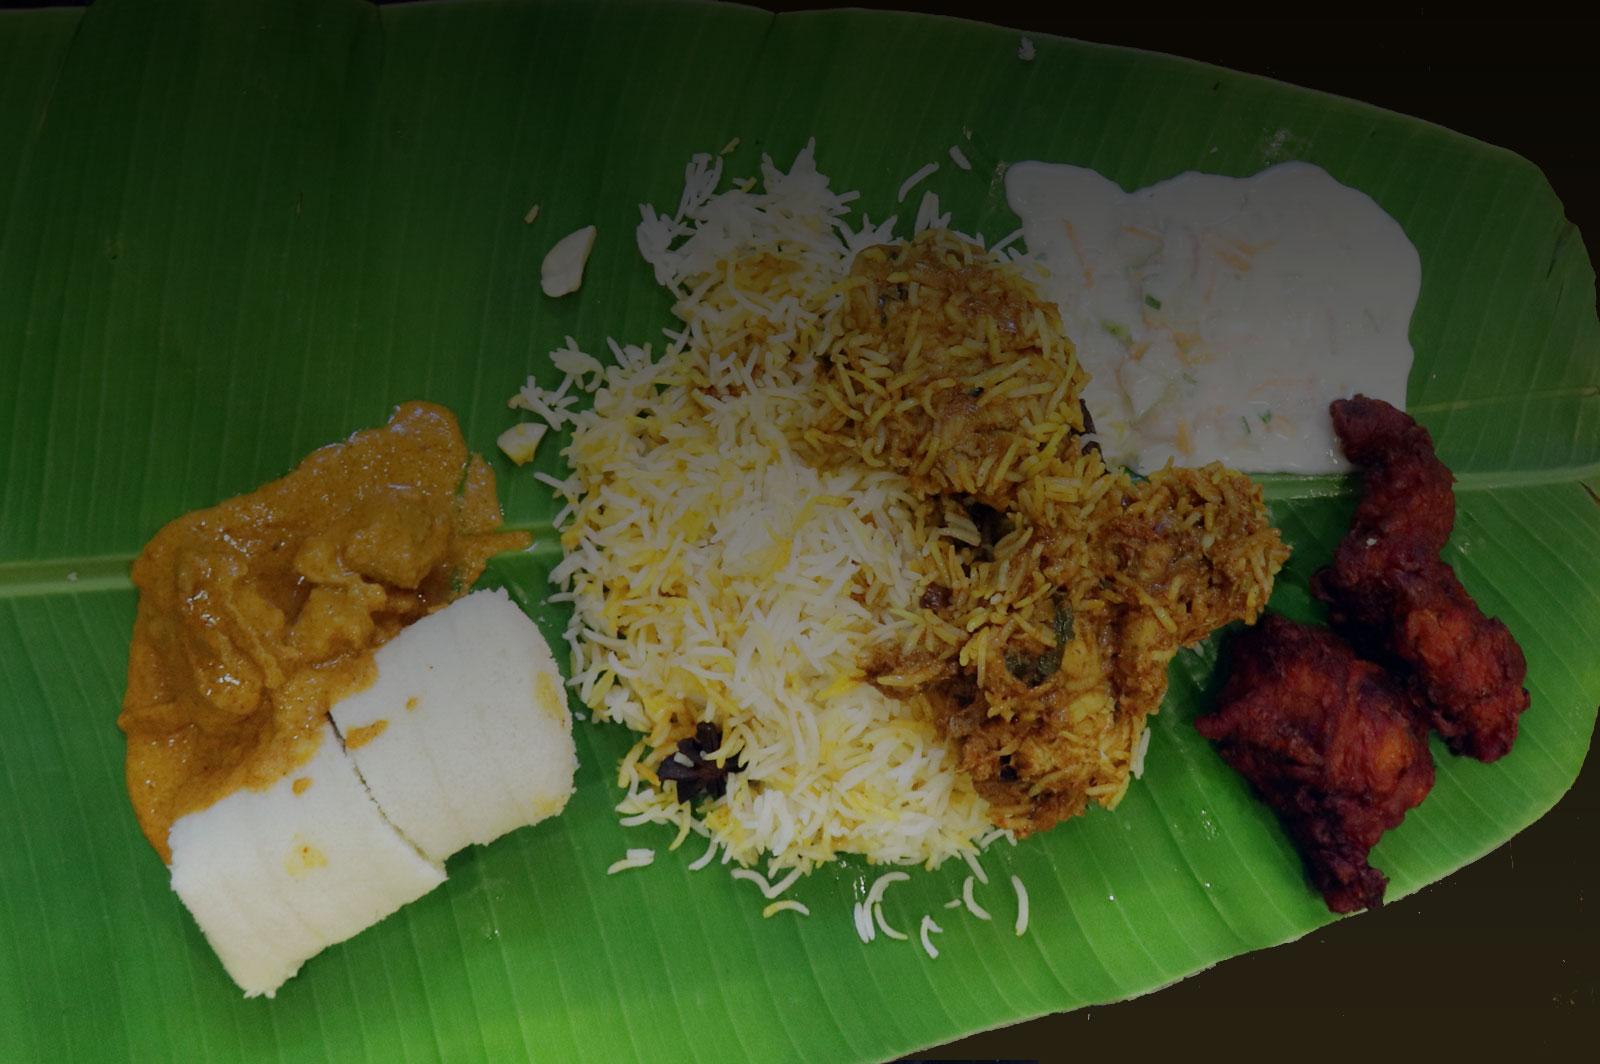 Banana leaf Fish Lunch Restaurasnt in Malpe.